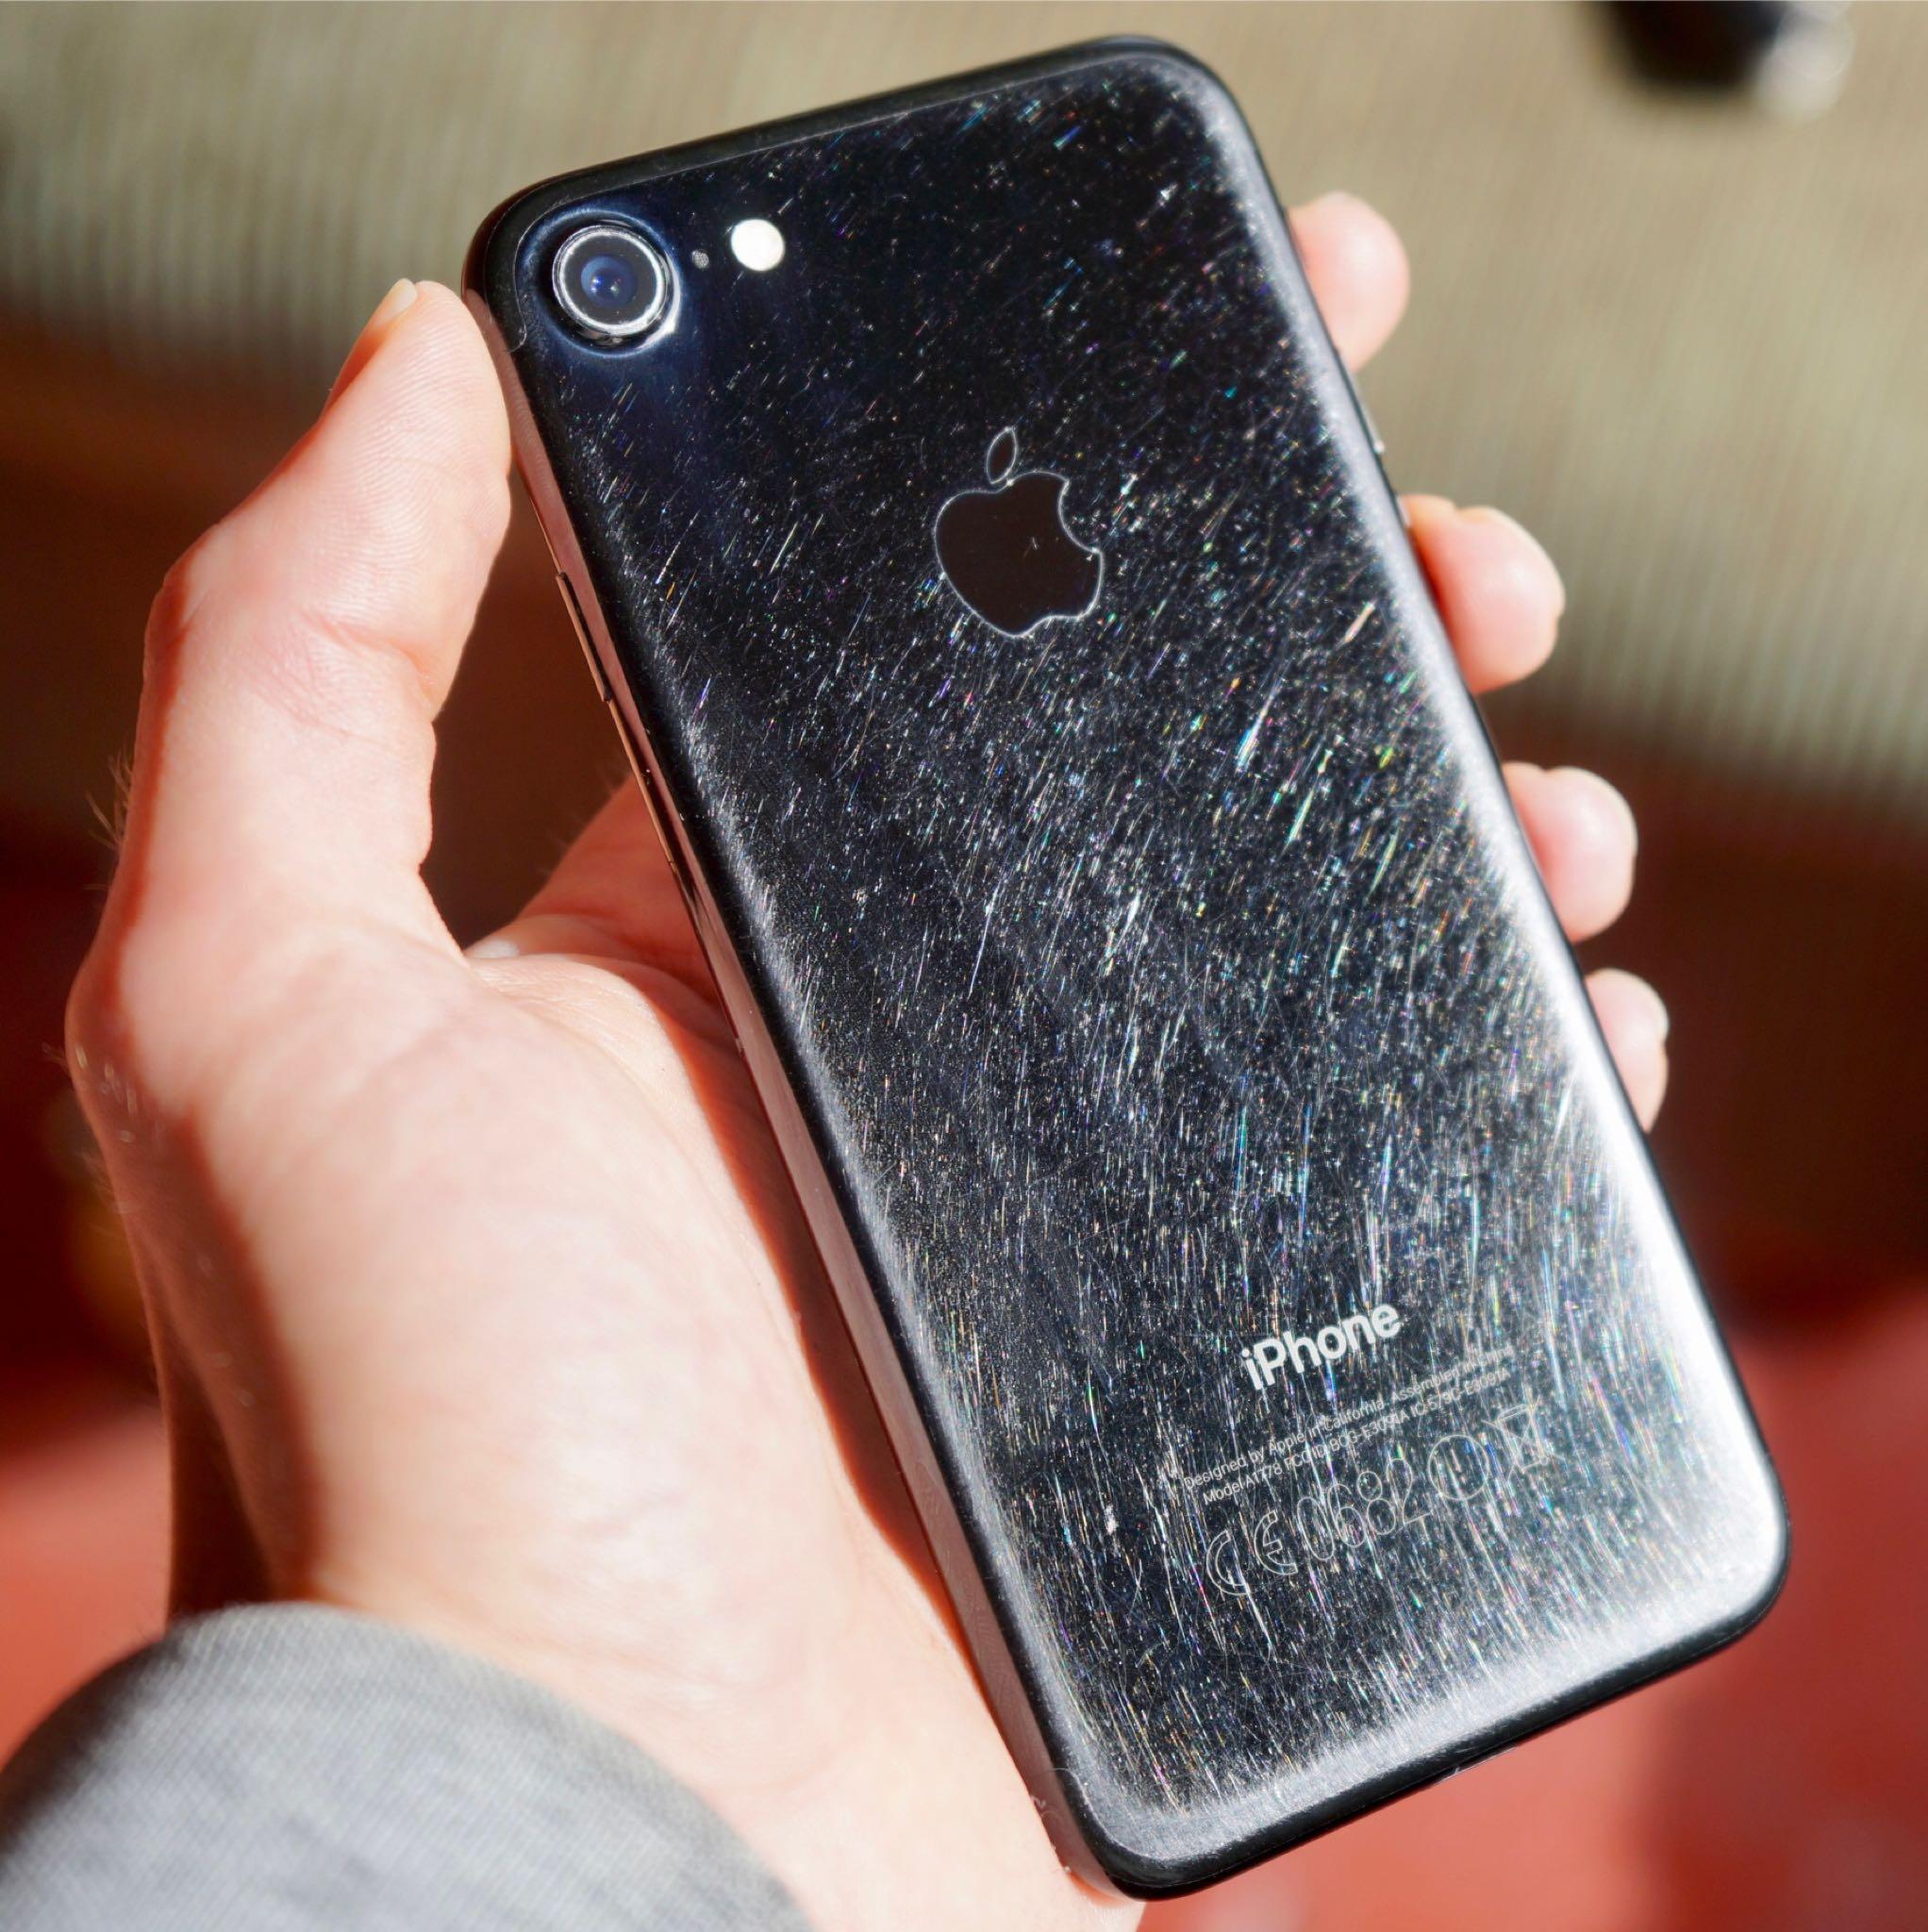 iPhone 7 jet black urat folosire 1